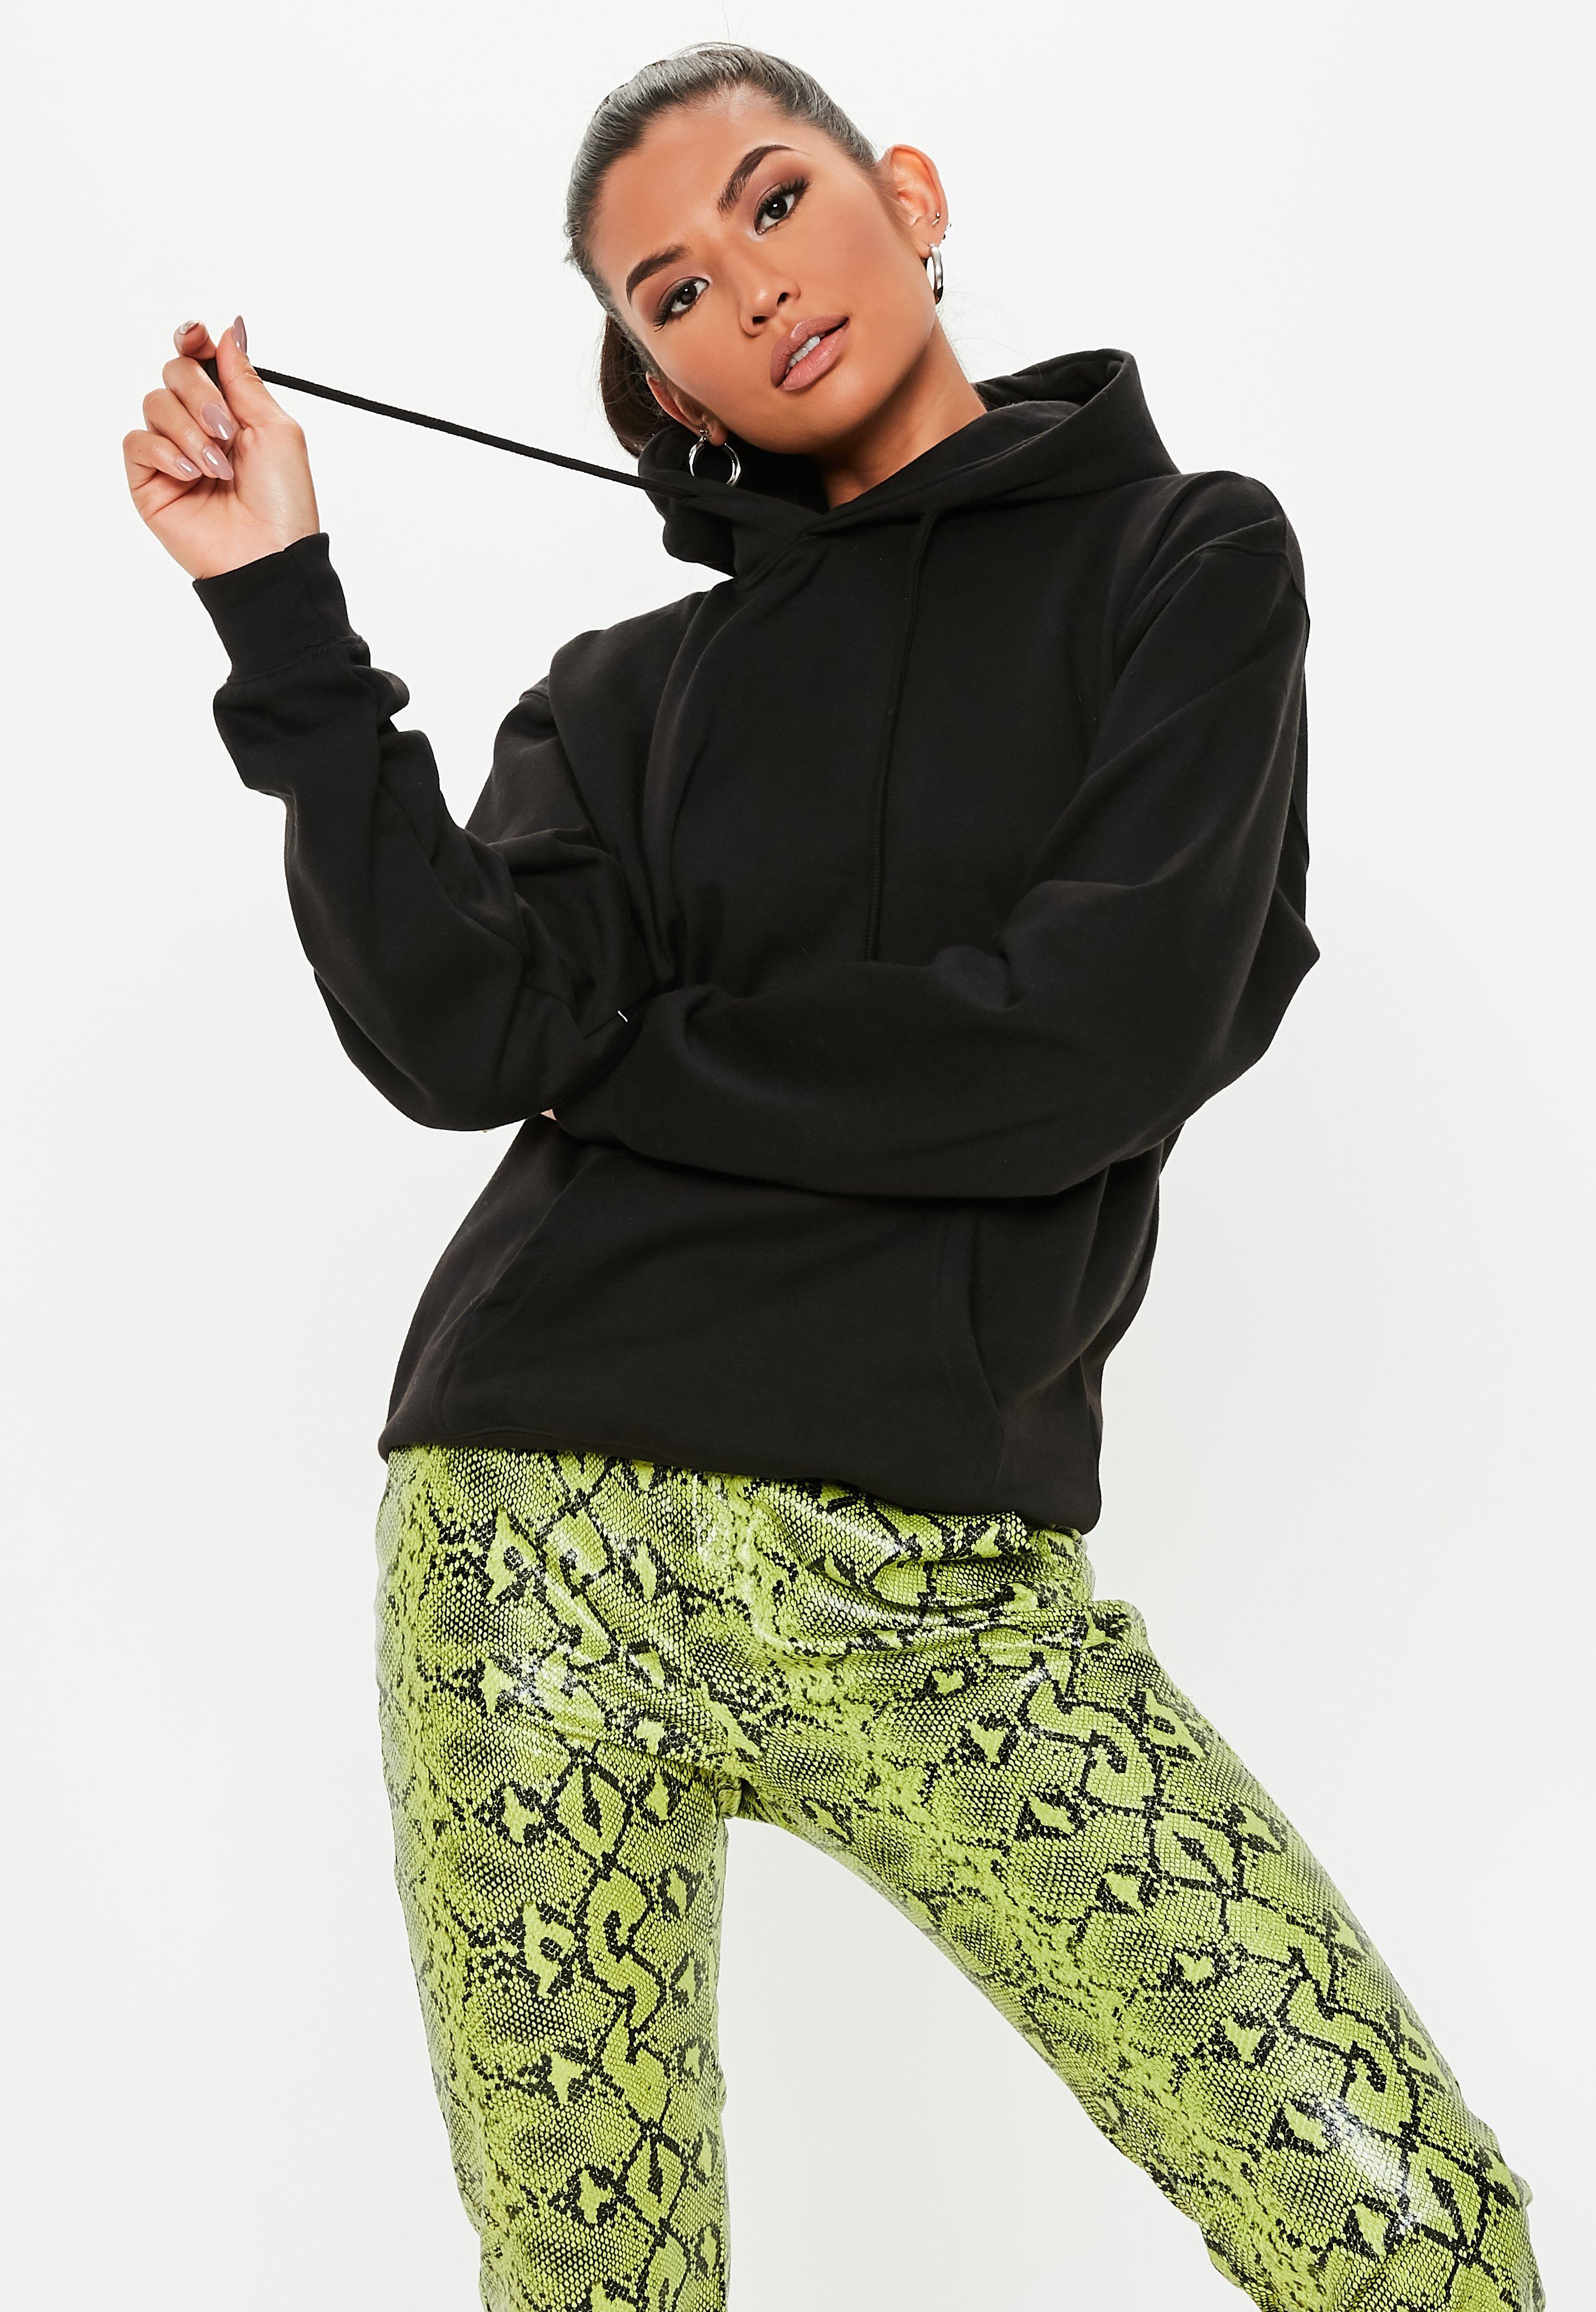 741f7c797393 Hoodies | Hooded Sweatshirts for Women - Missguided